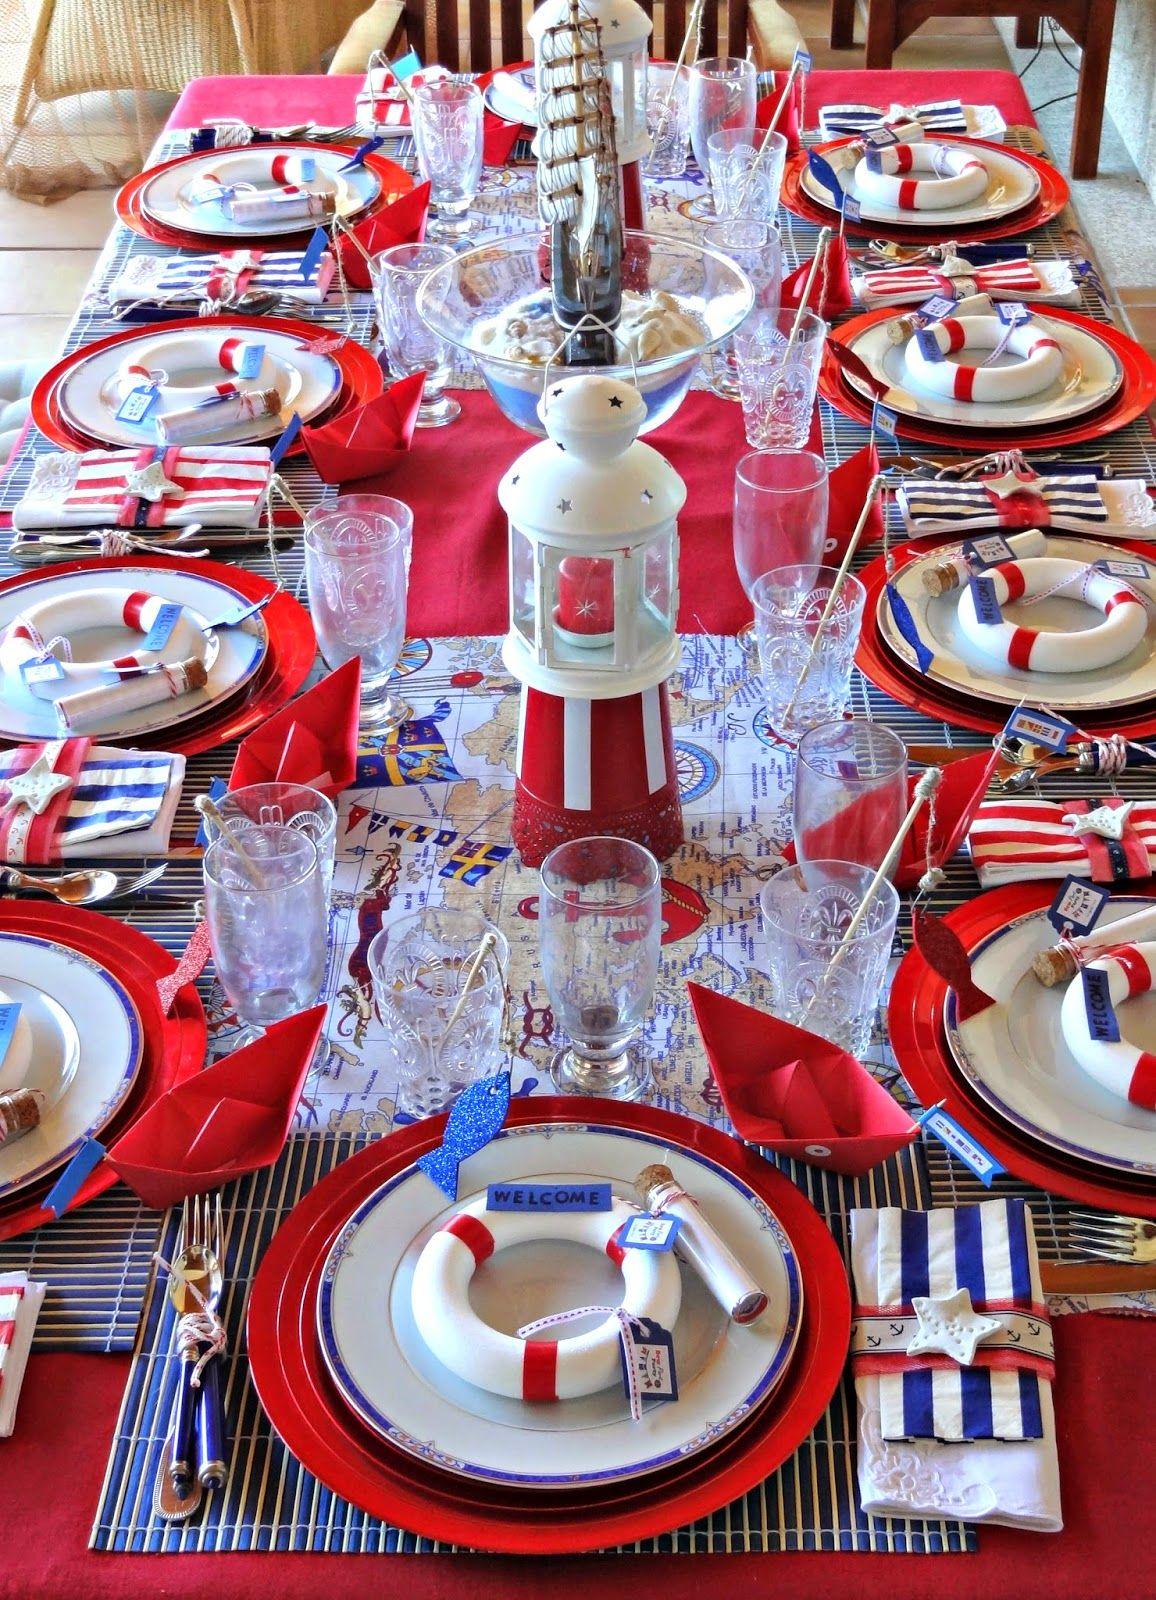 Deco marina preciosa party and events pinterest fiestas cumple y fiesta marinera - Fiesta marinera decoracion ...